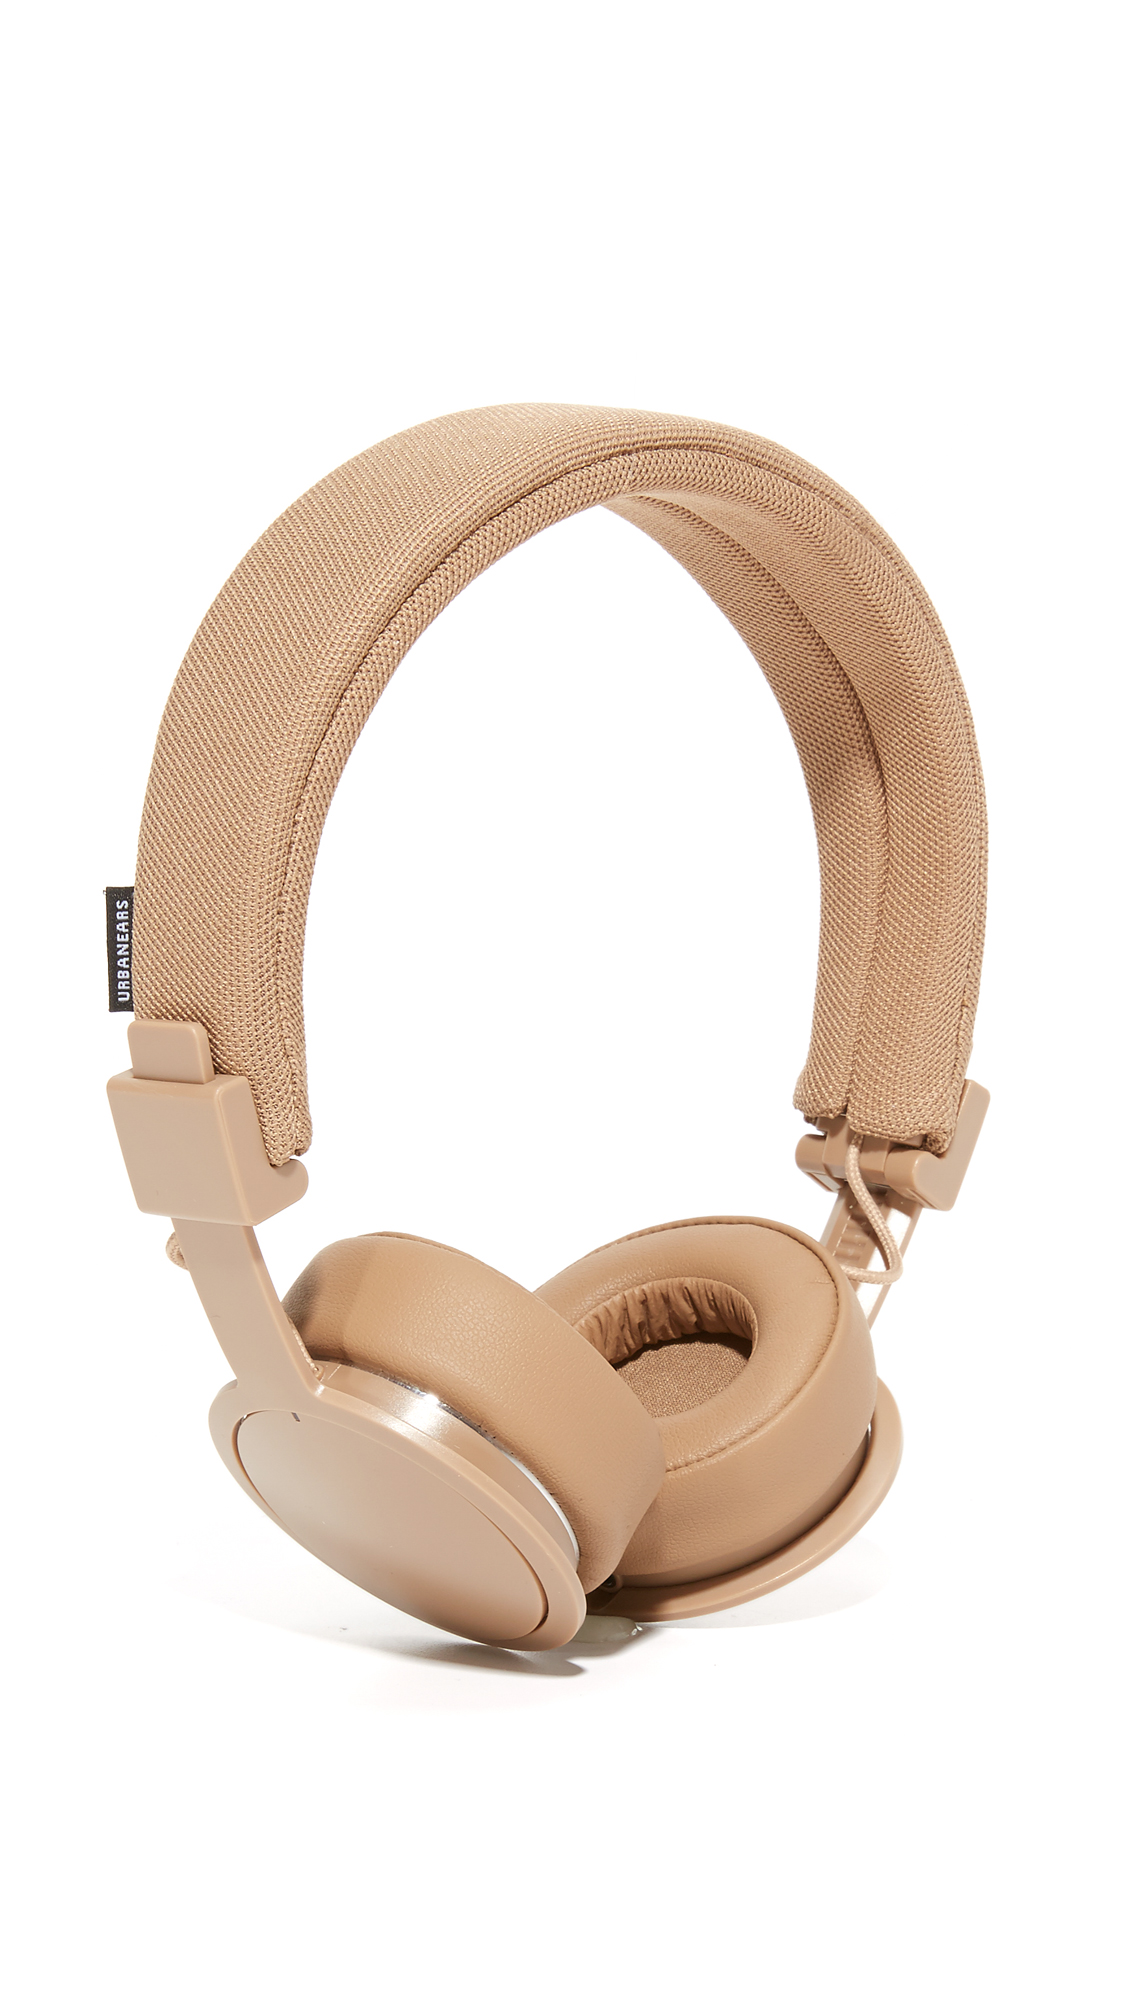 Urbanears Plattan Wireless Headphones Shopbop Ii Powder Pink